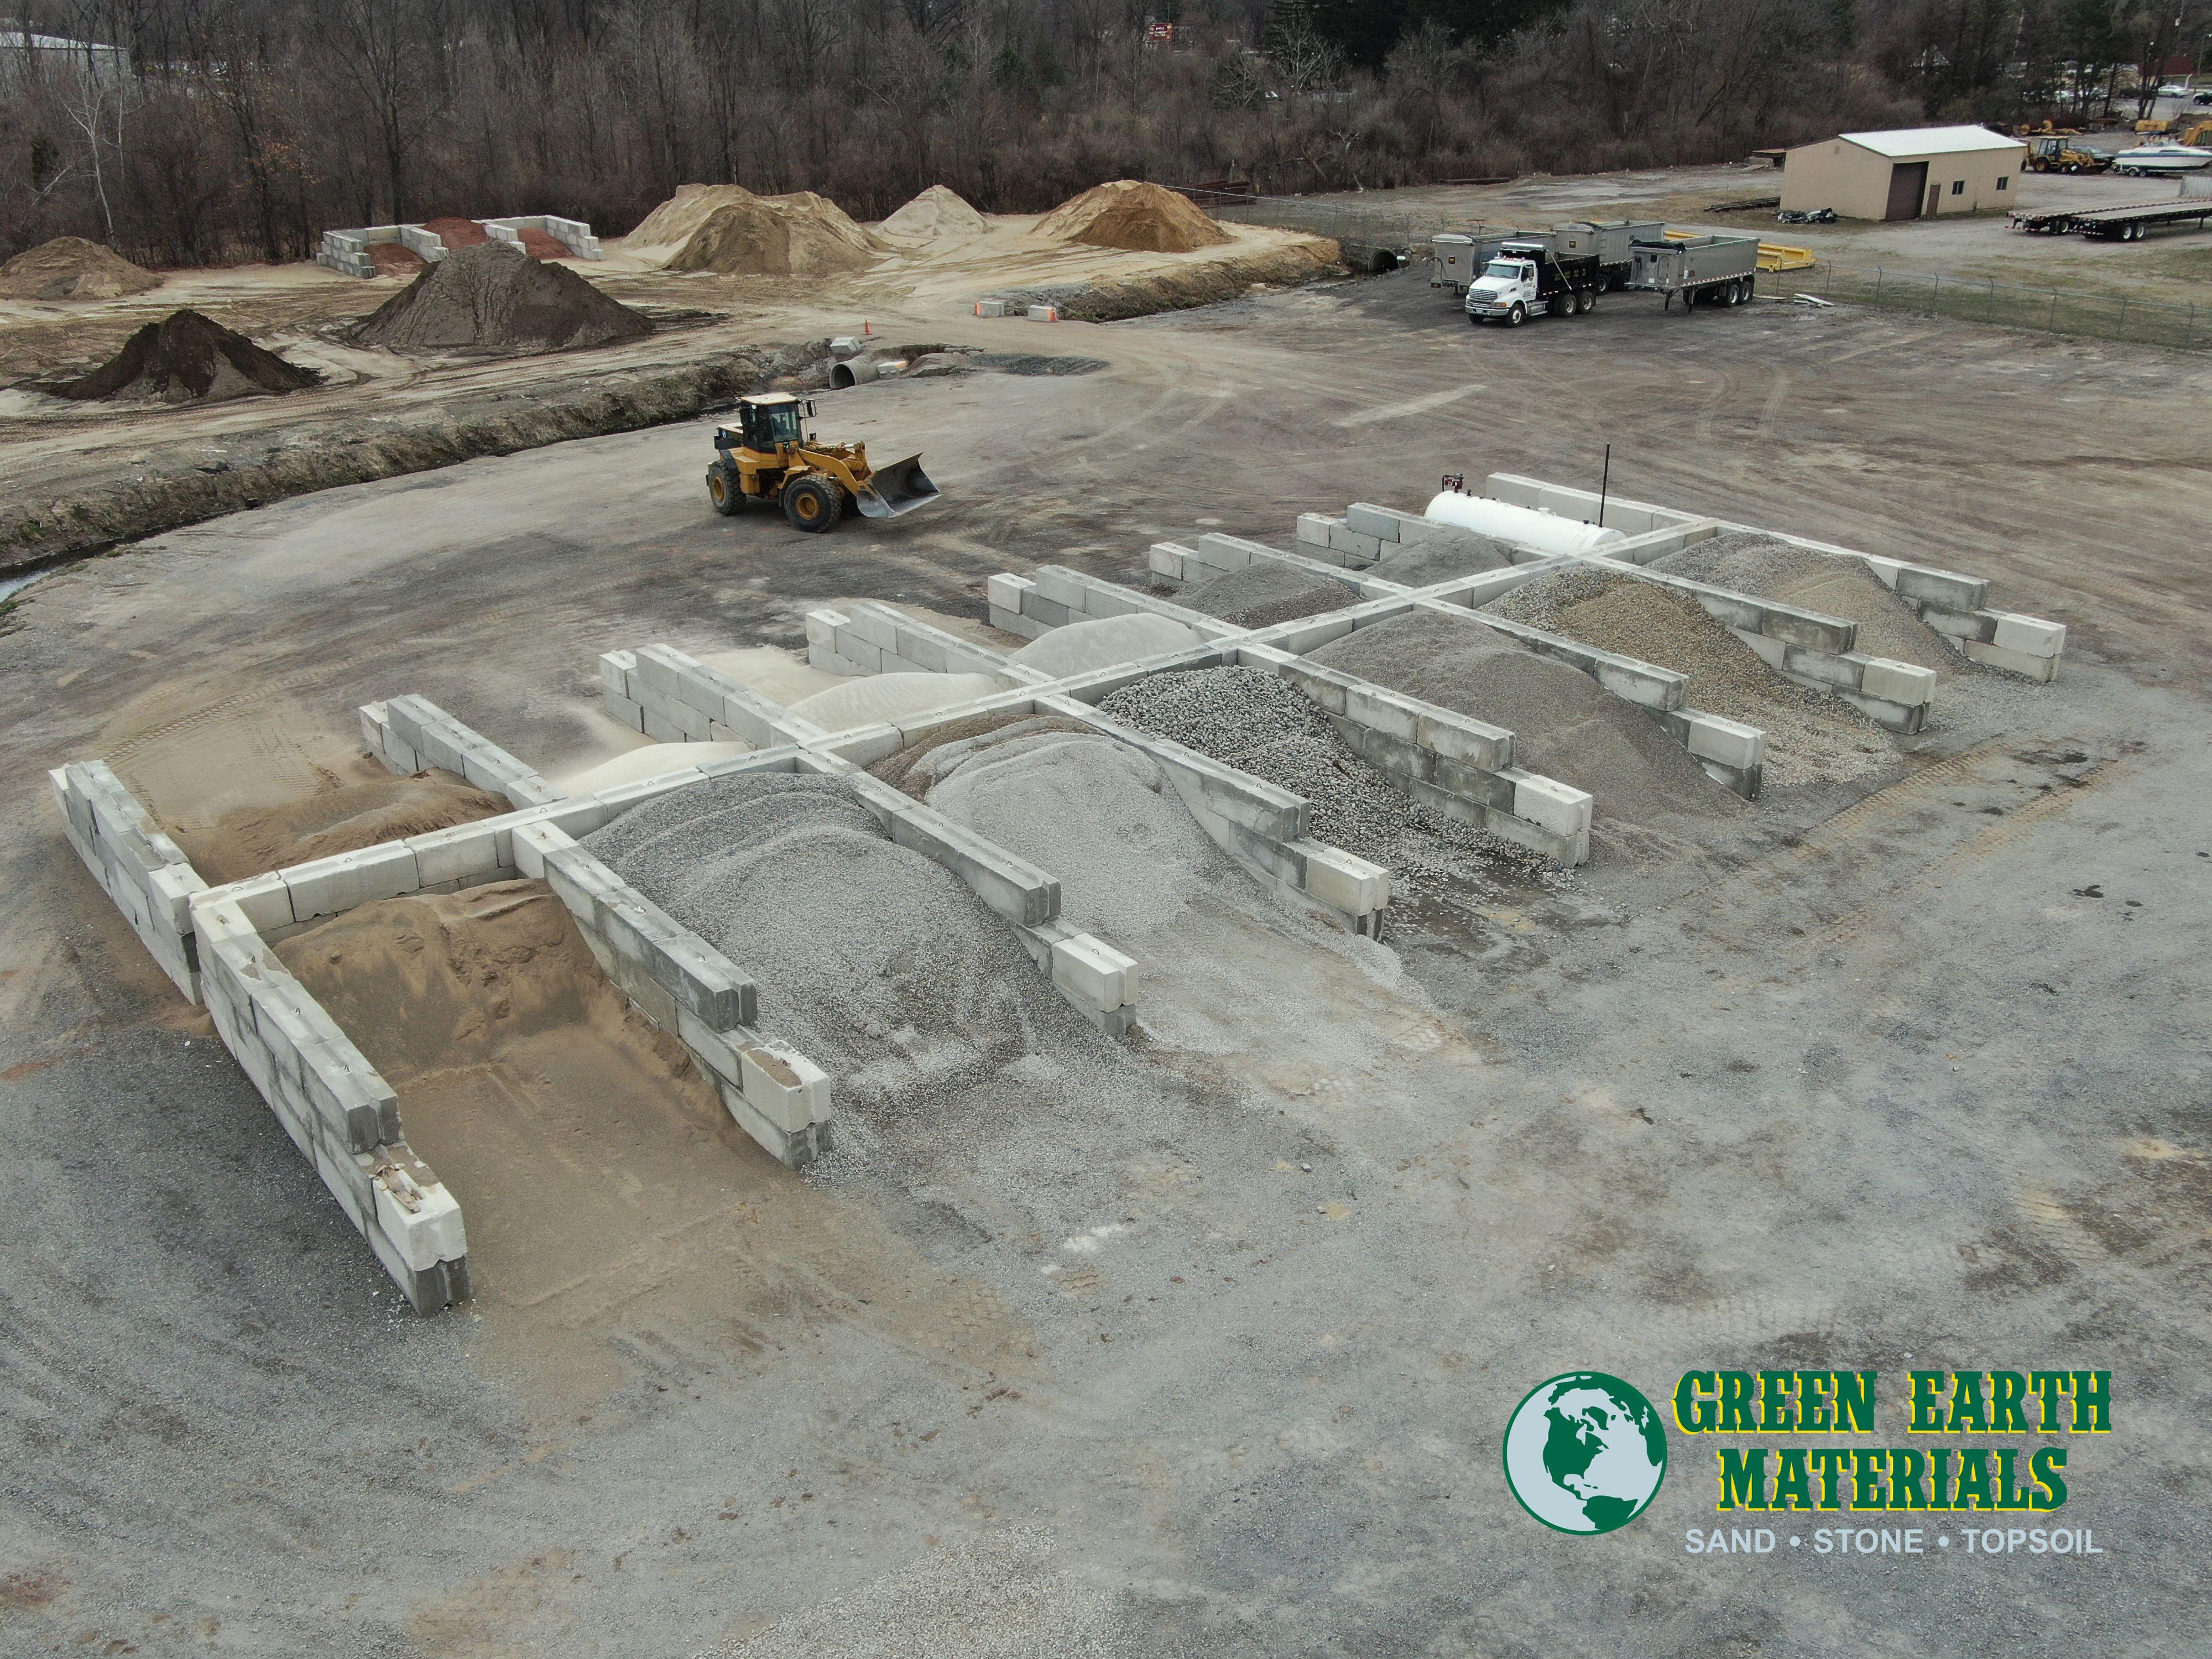 Green Earth Yard